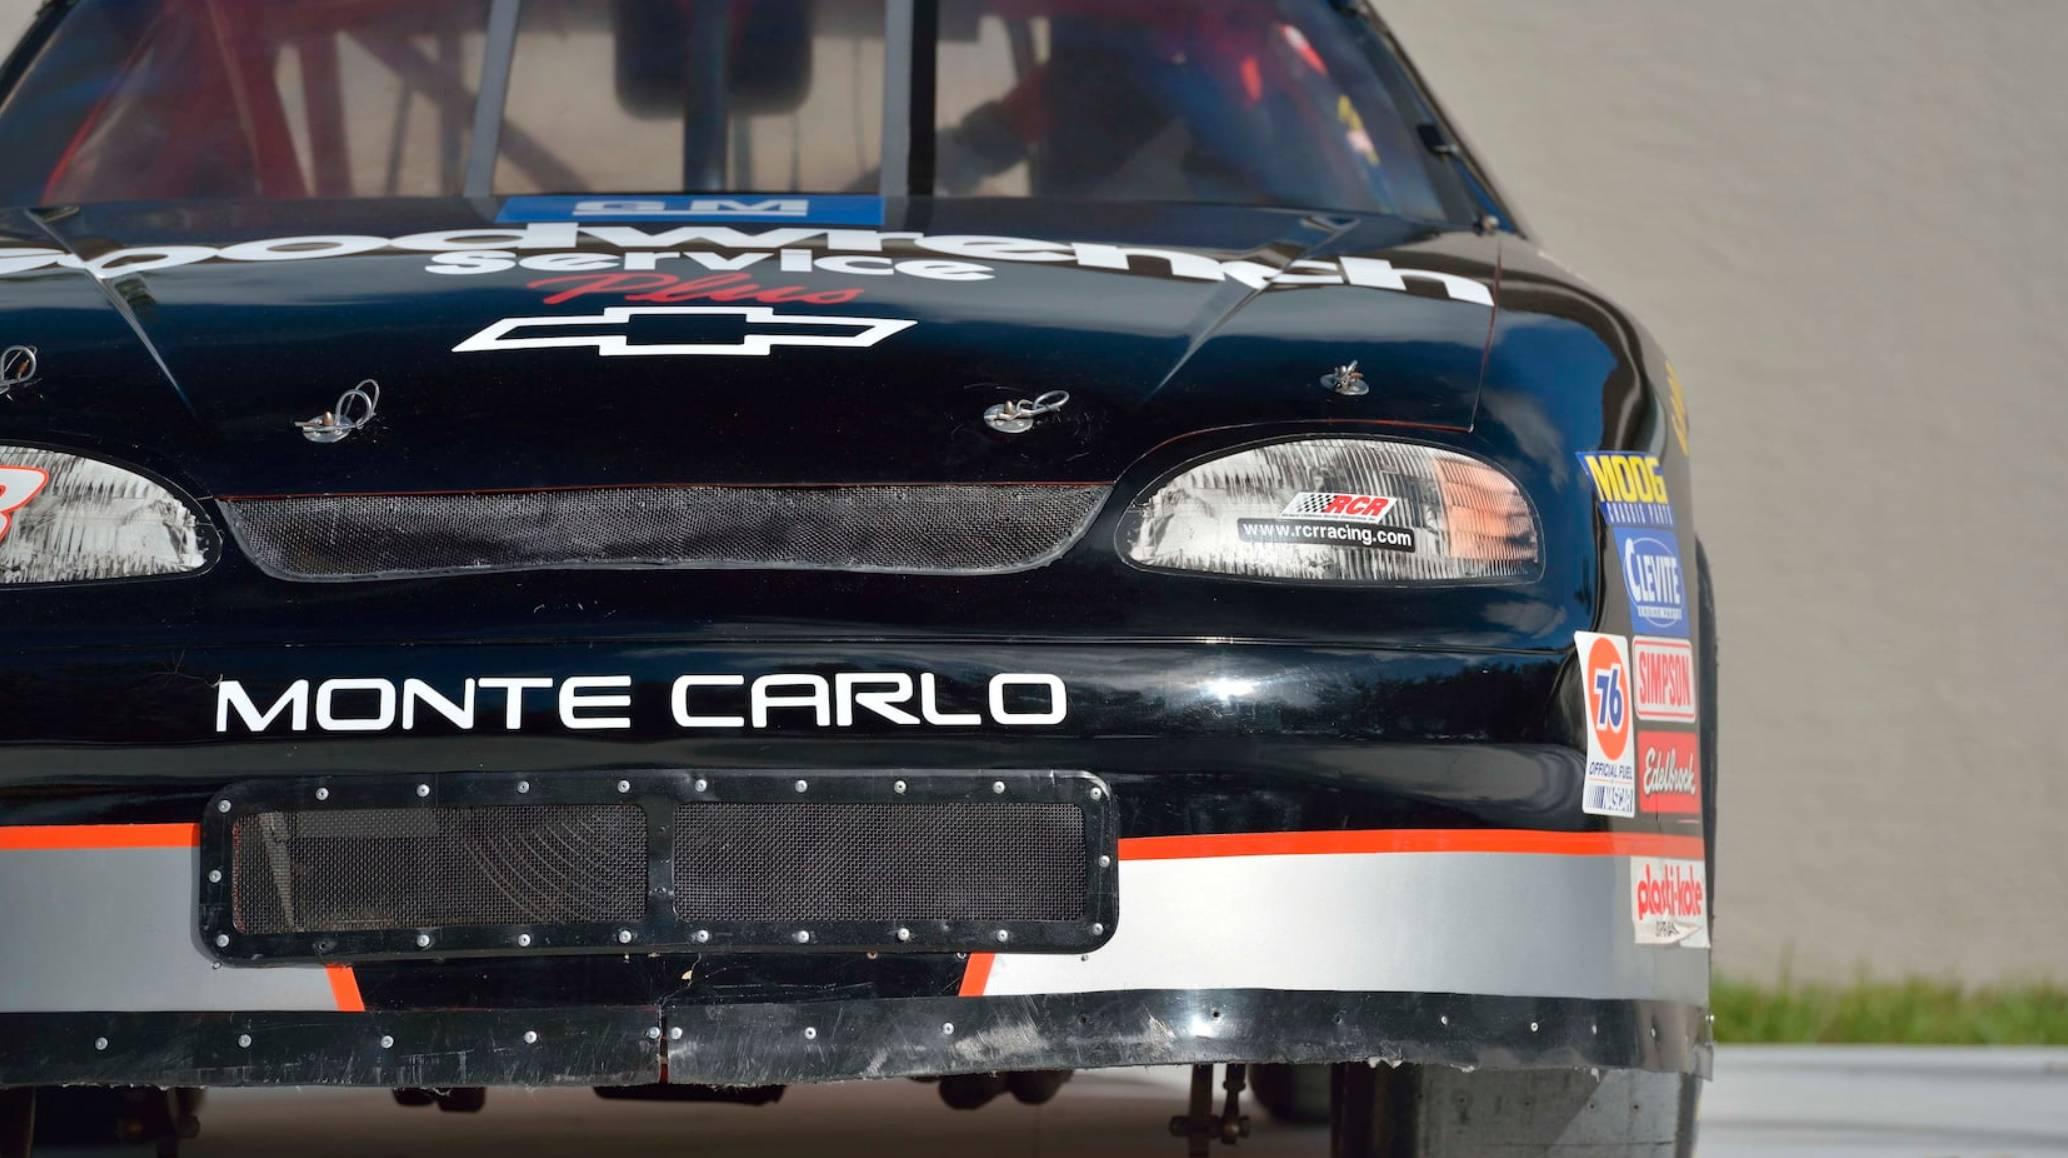 Chevrolet Monte Carlo - Dale Earnhardt